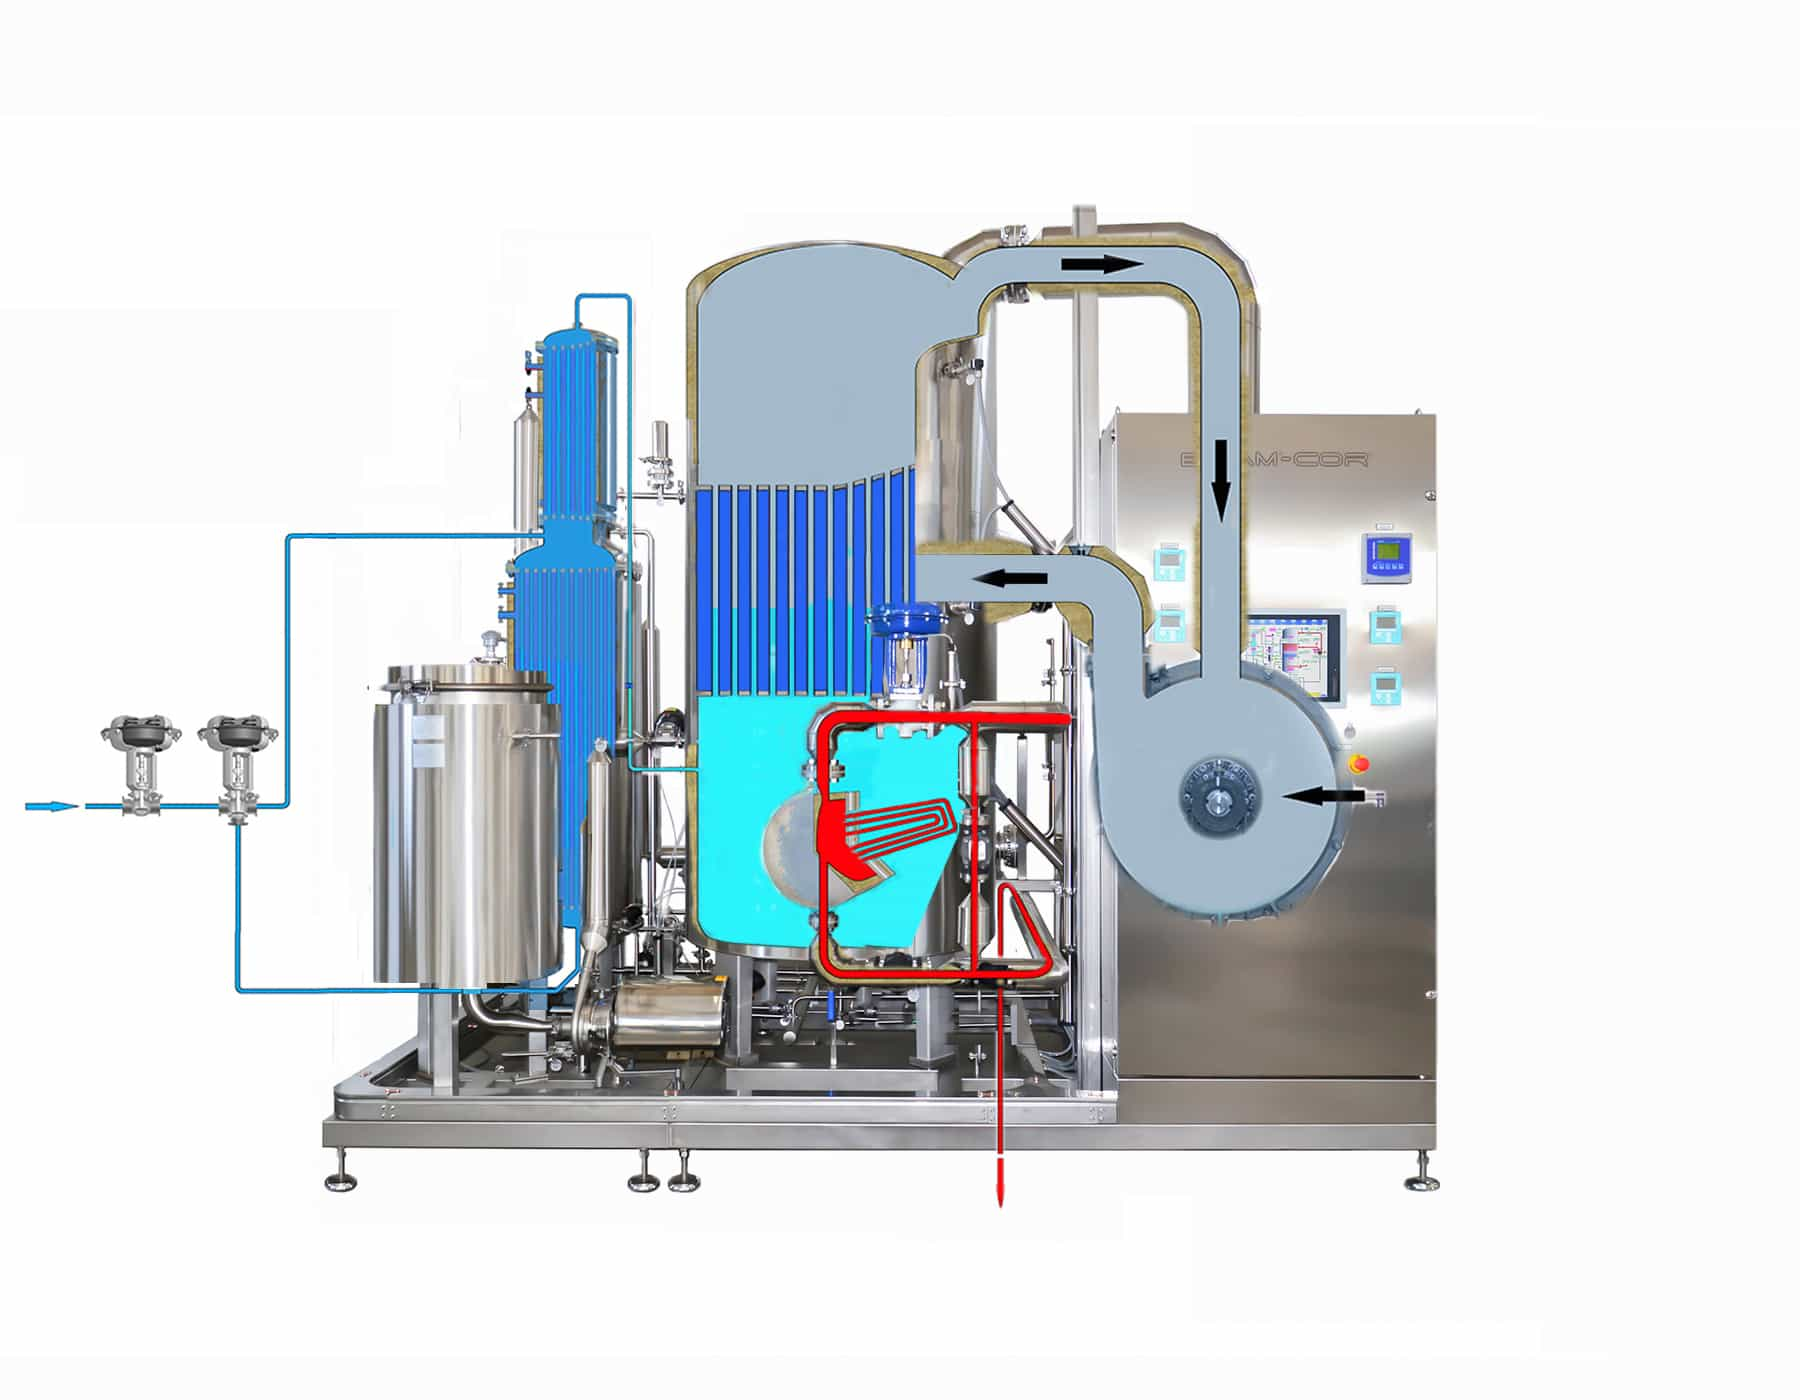 Vapor Compression Distillation process - Step 5-6